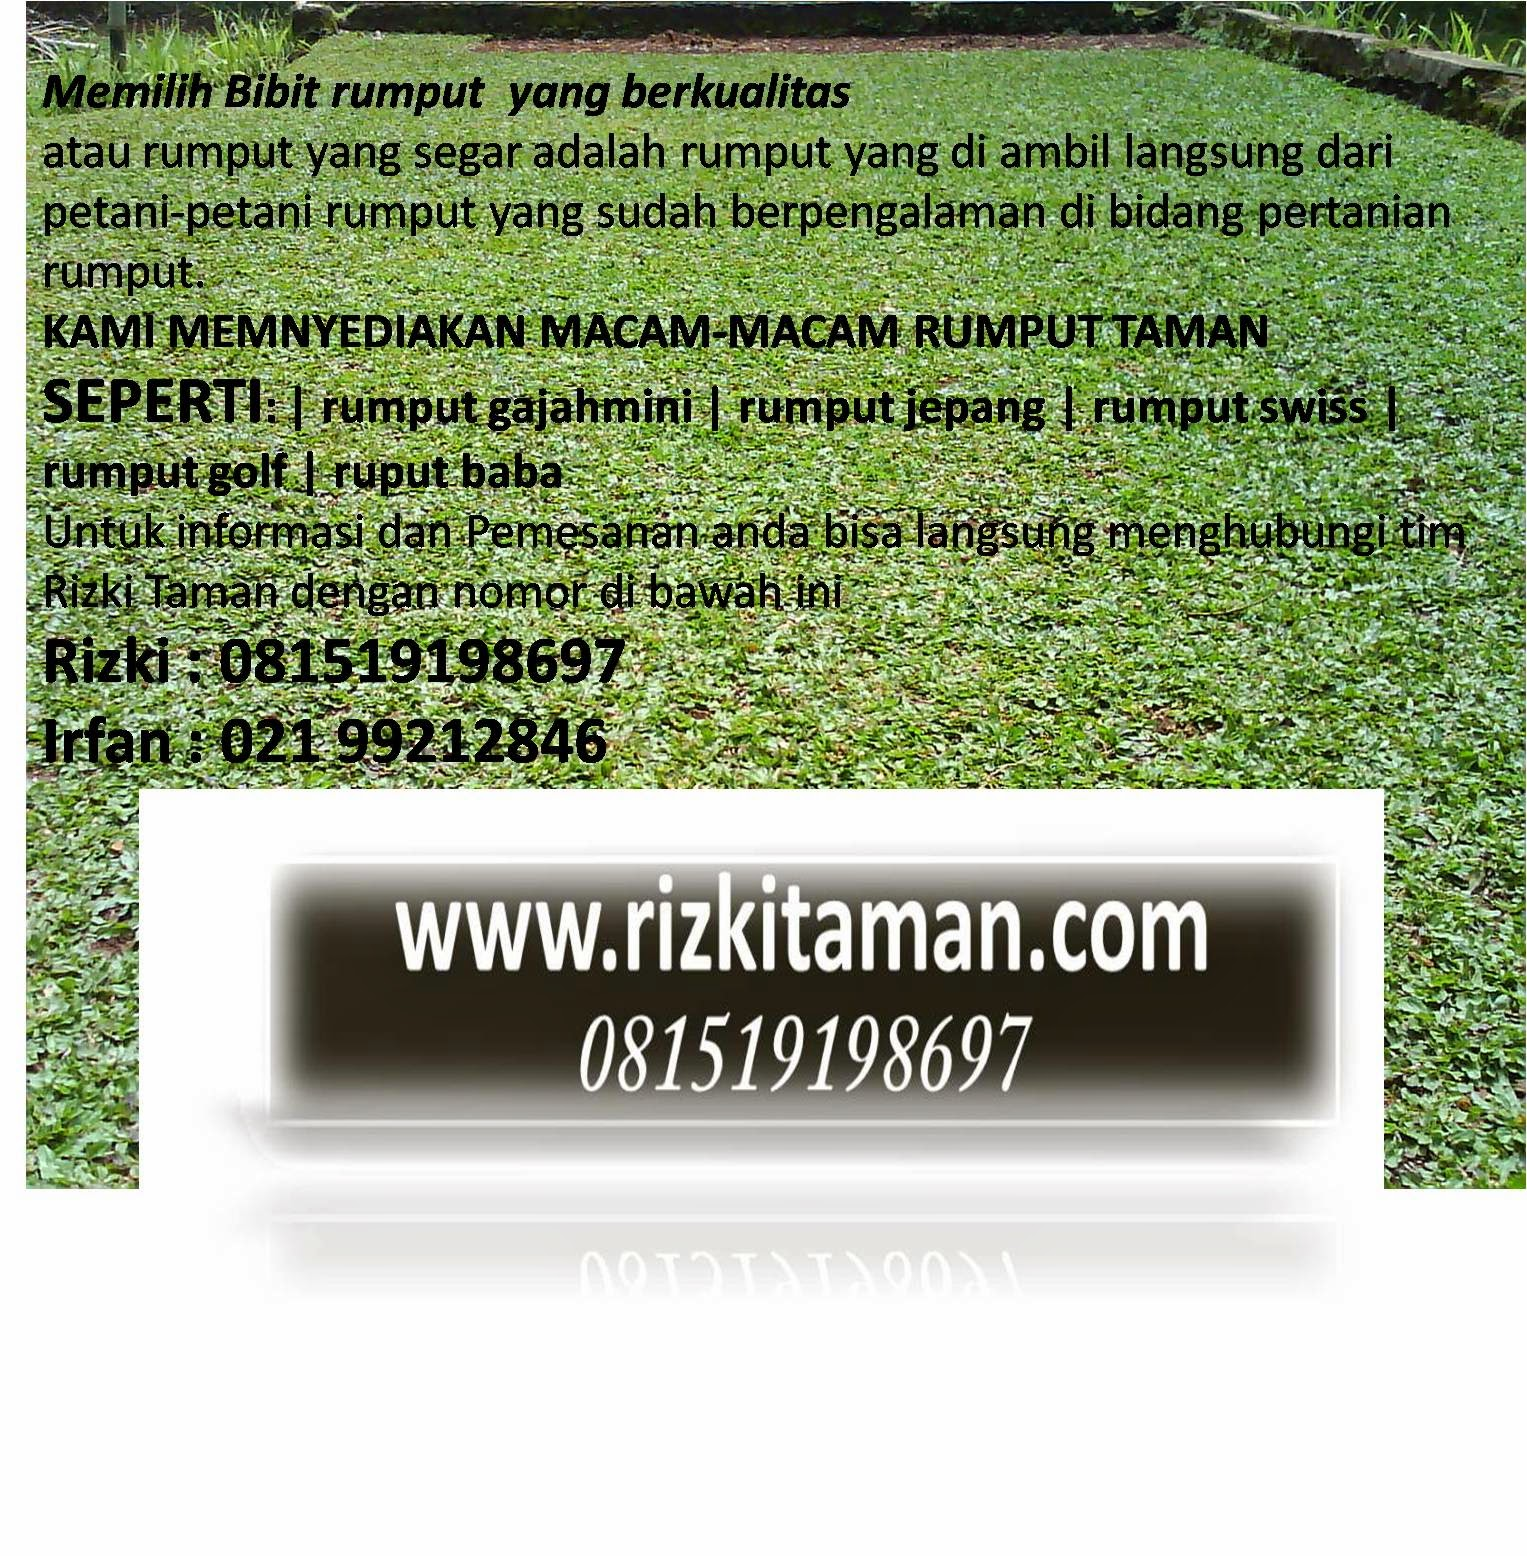 Tukang rumput gajahmini | jasa tanam rumput dan pembuatan taman minimalis